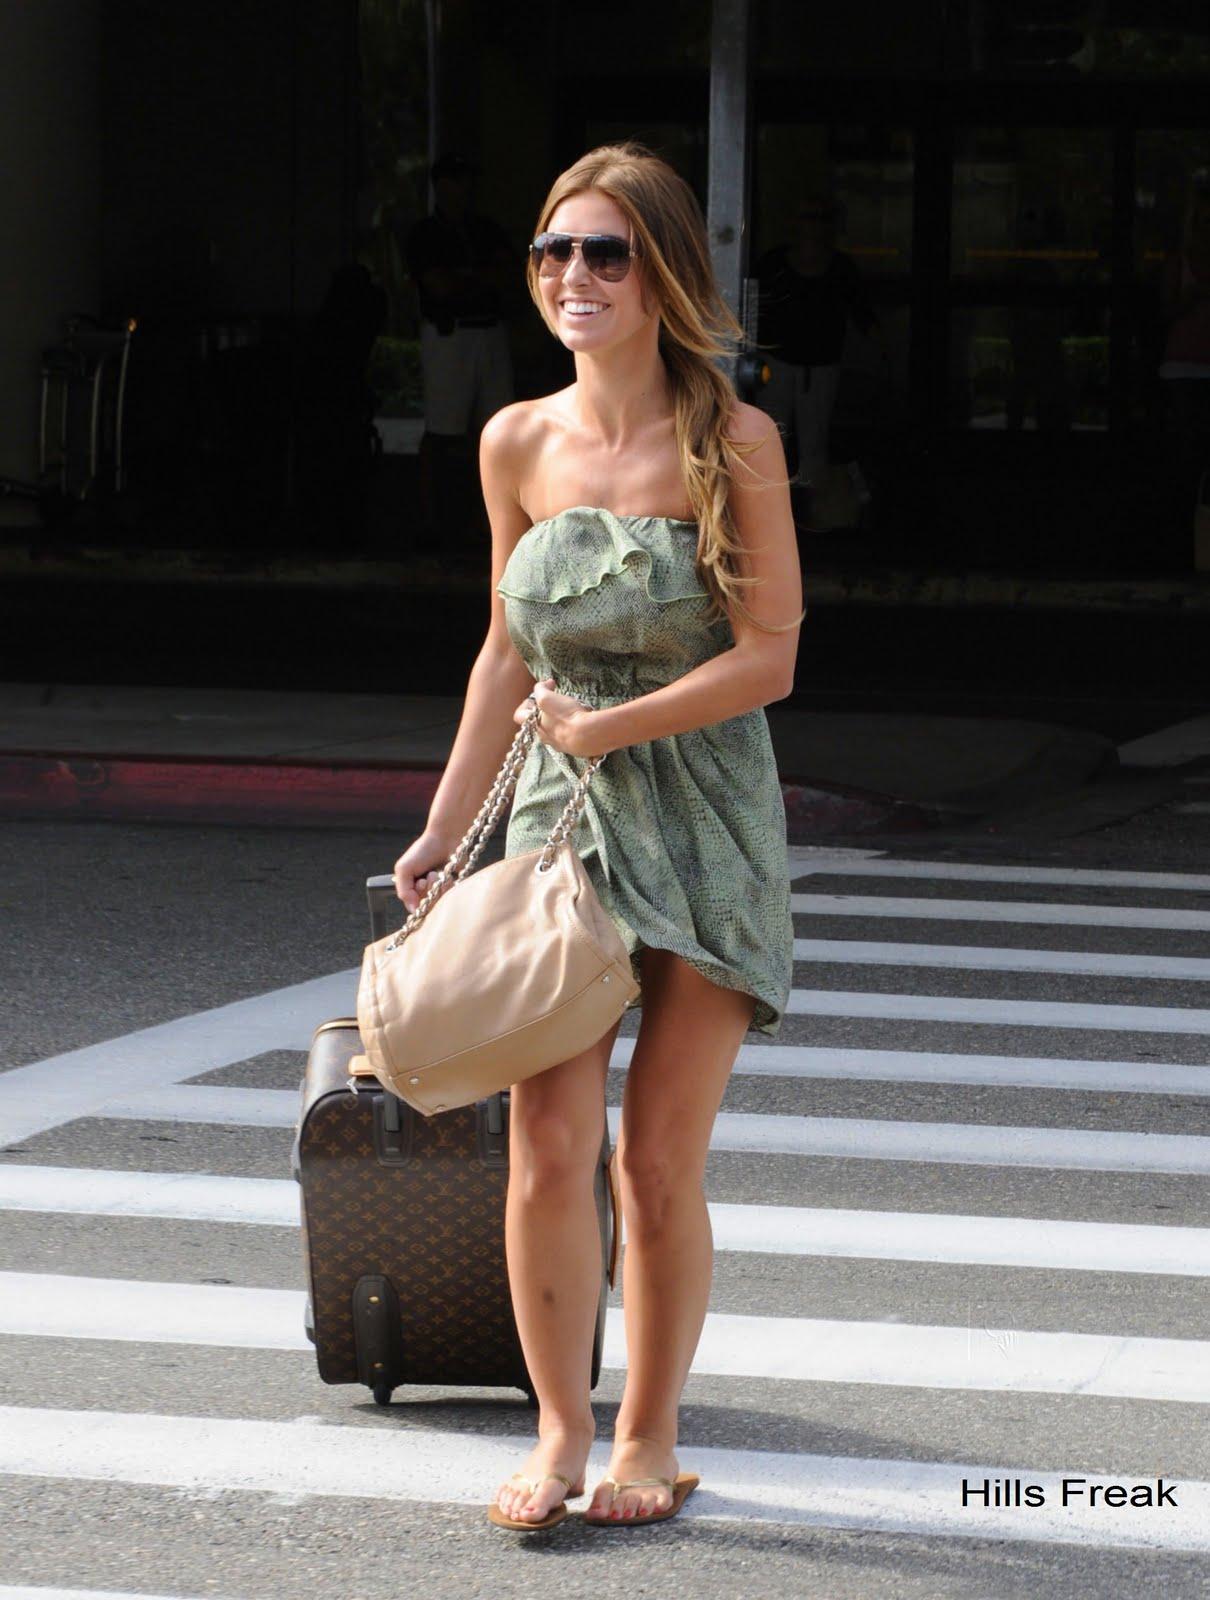 http://3.bp.blogspot.com/-kHgQ4FkSUSE/UBZeaFSUhjI/AAAAAAAABA4/_JWygYxkHSc/s1600/audrinapatridge-airport-6.jpg